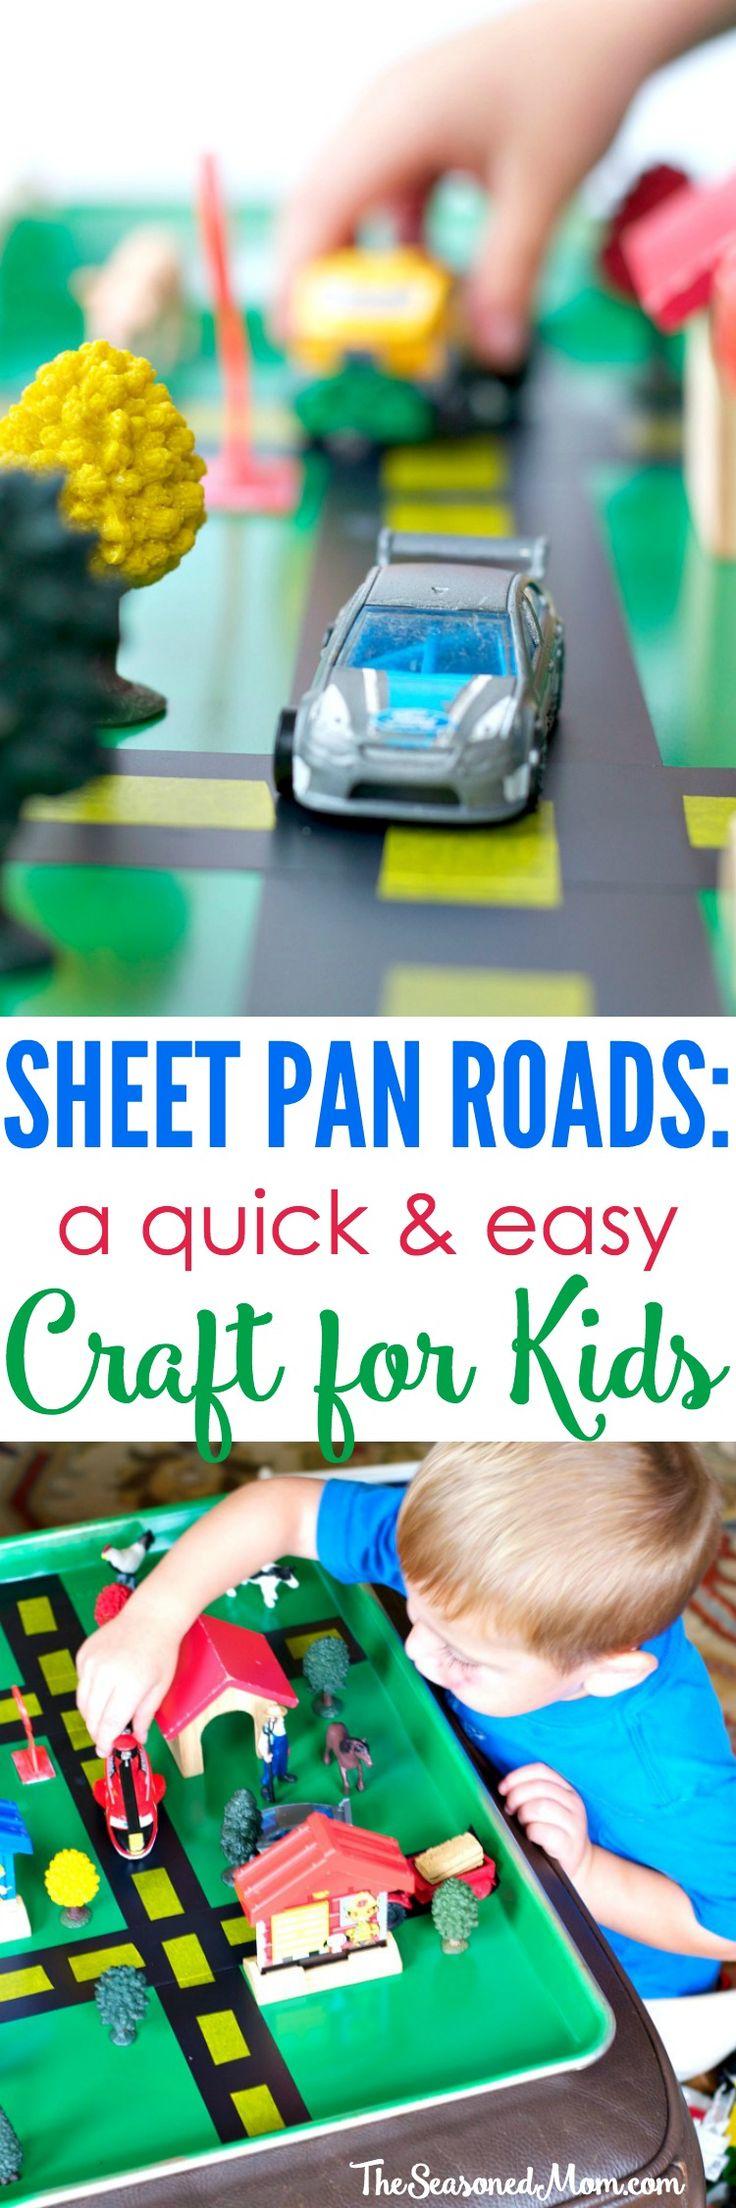 homemade gift for kids sheet pan roads - Toddler Boy Sheets